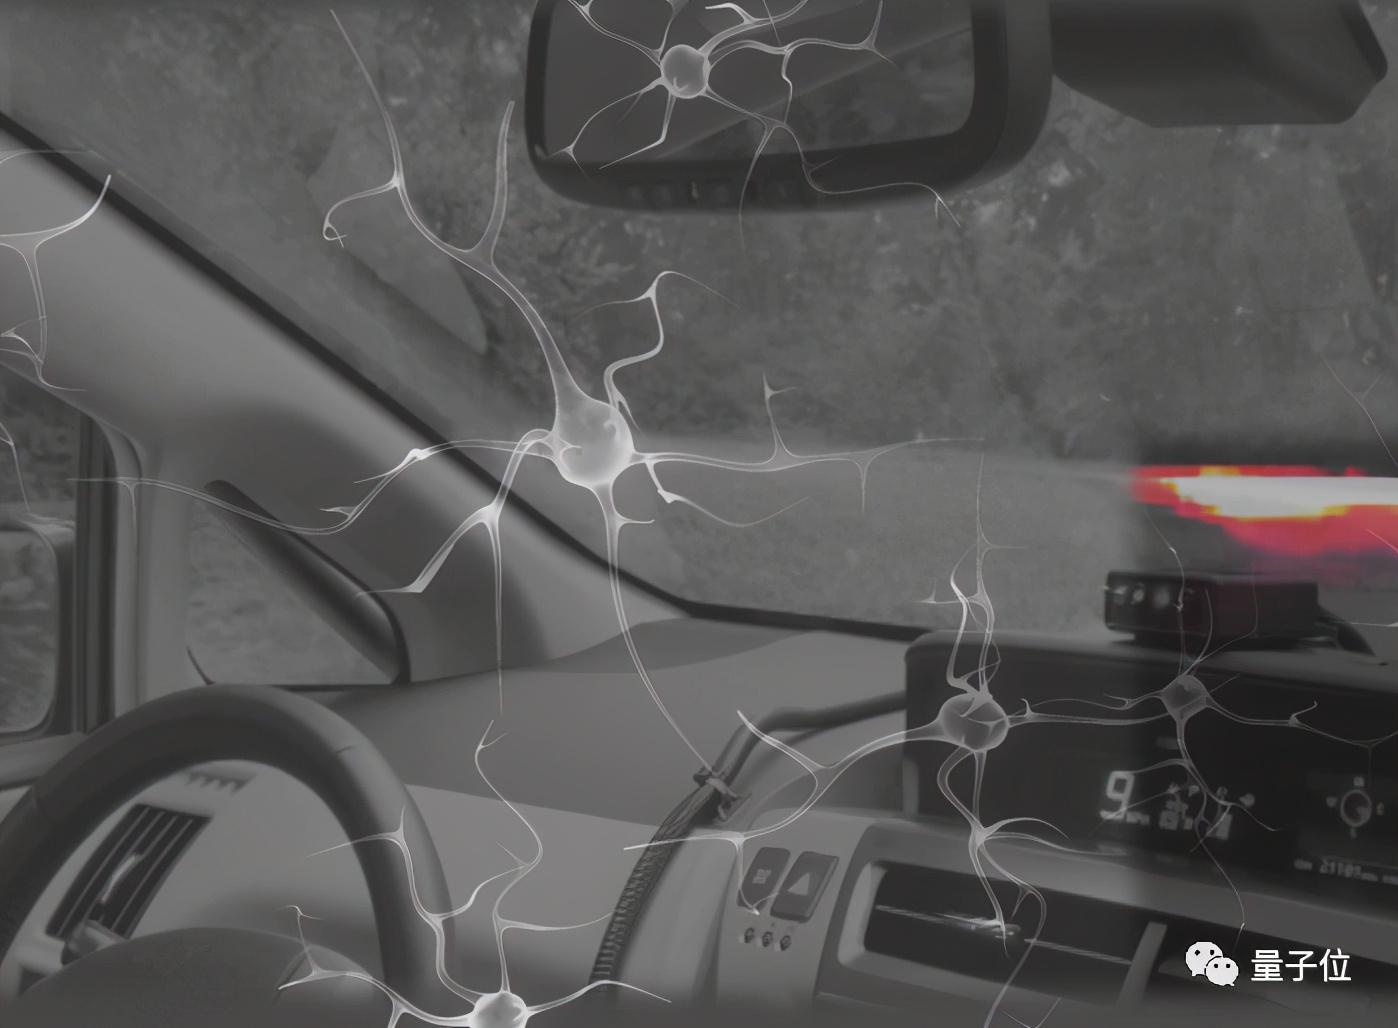 MIT用19个神经元实现自动驾驶控制,灵感来自秀丽隐杆线虫